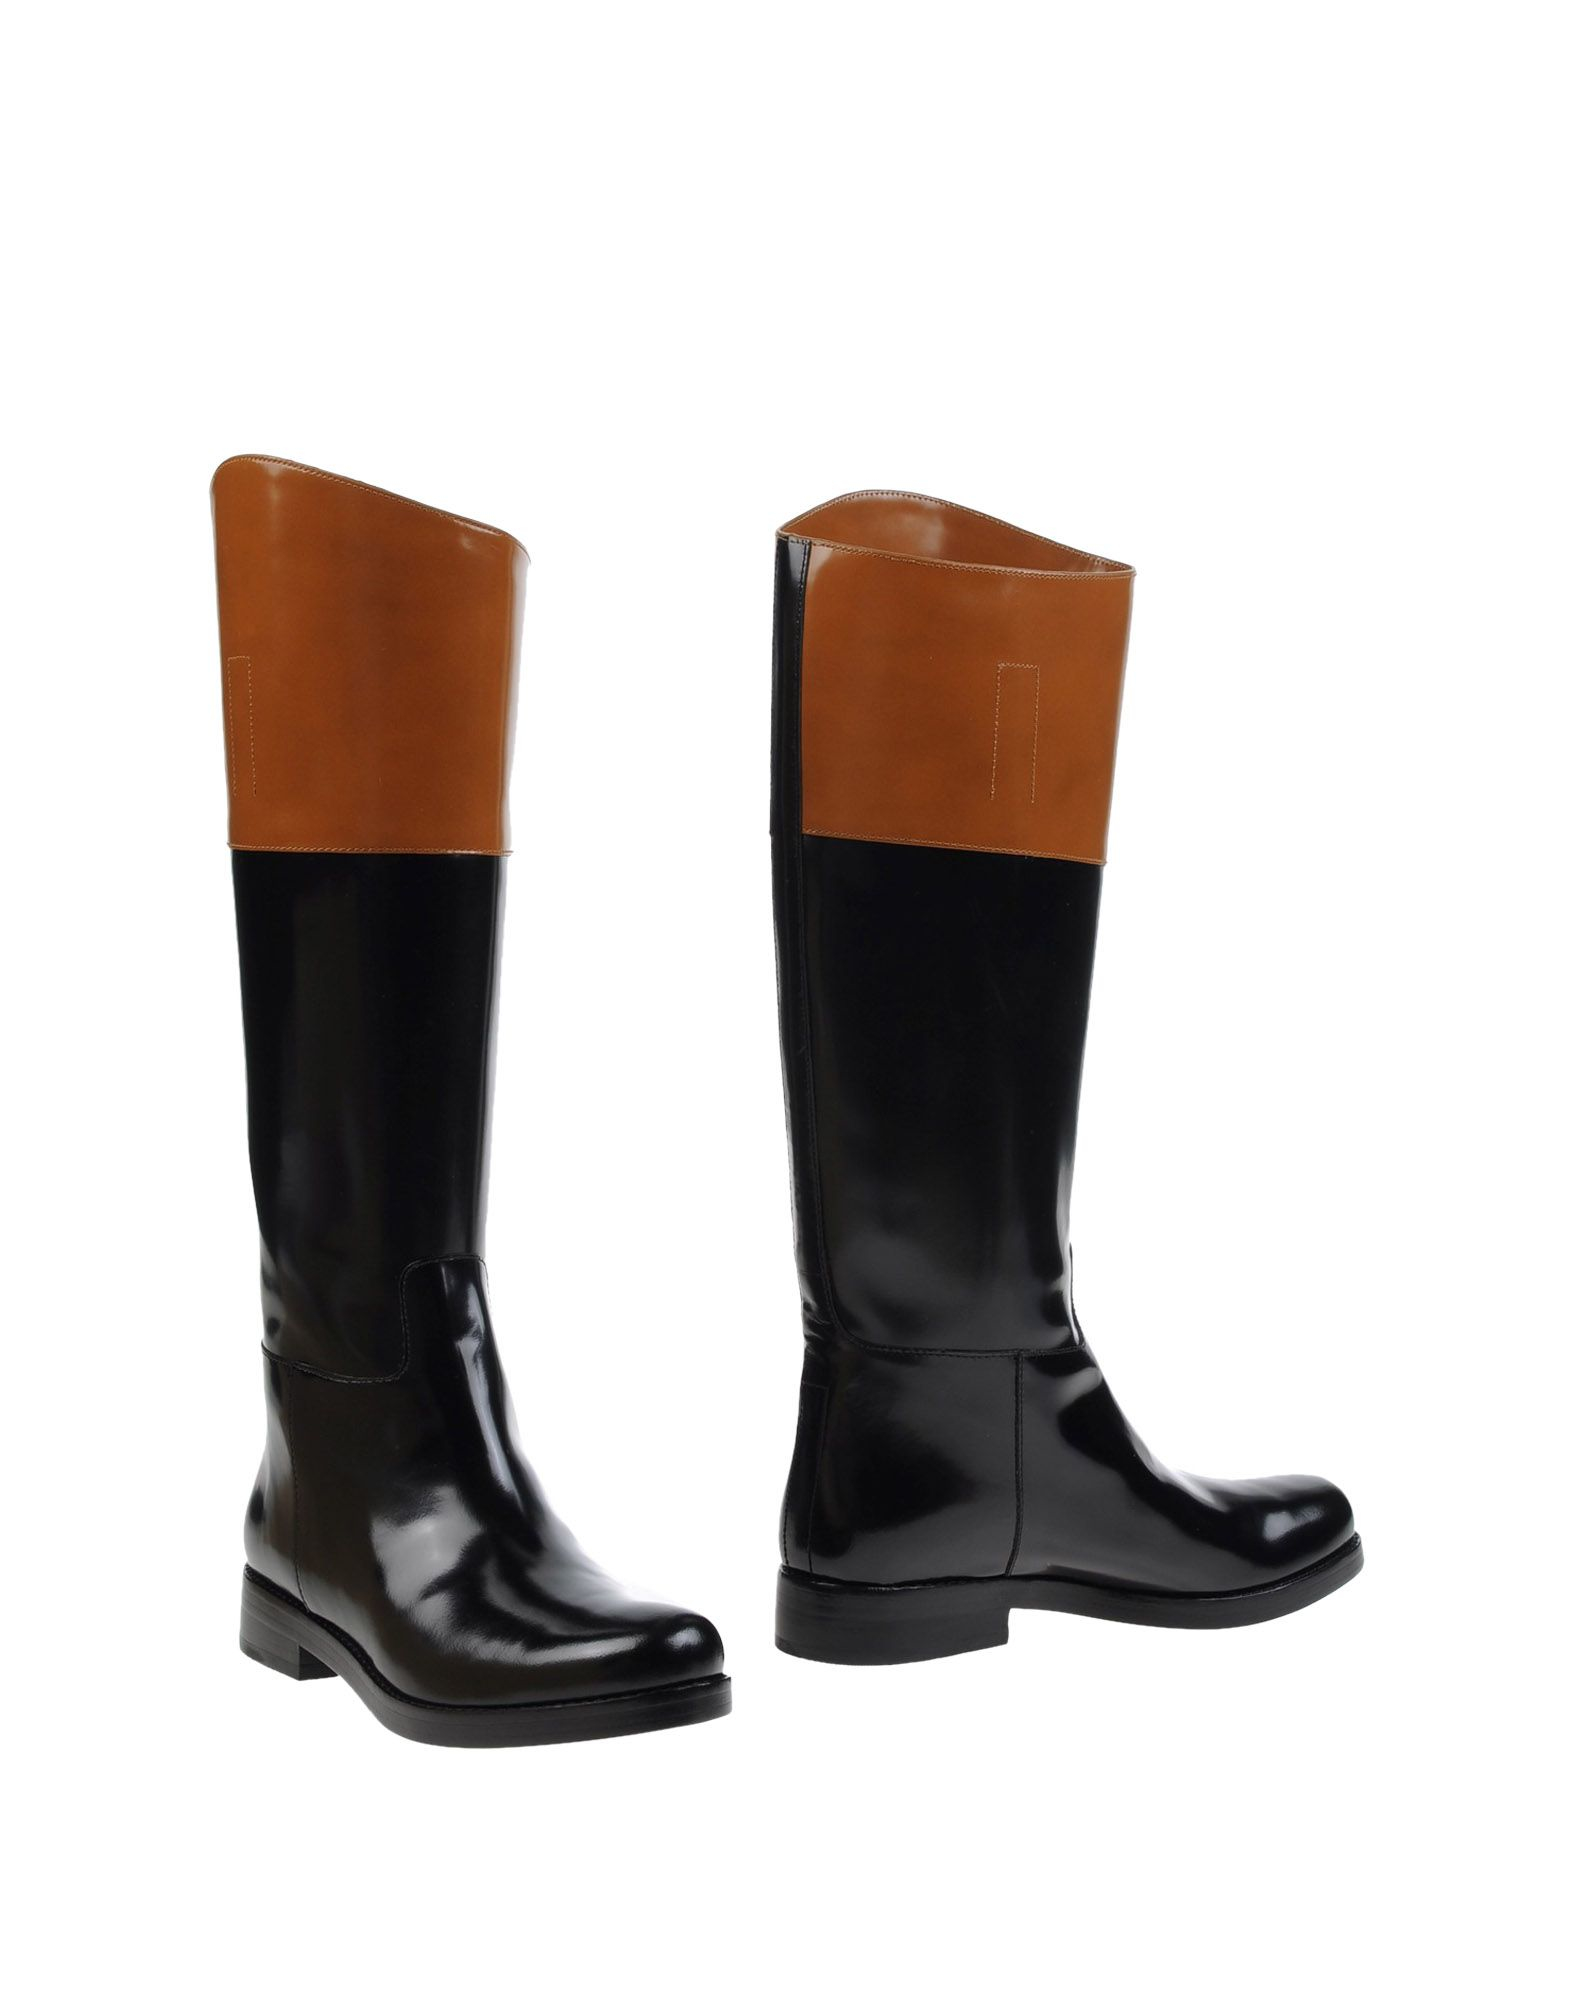 michael kors boots in black lyst. Black Bedroom Furniture Sets. Home Design Ideas